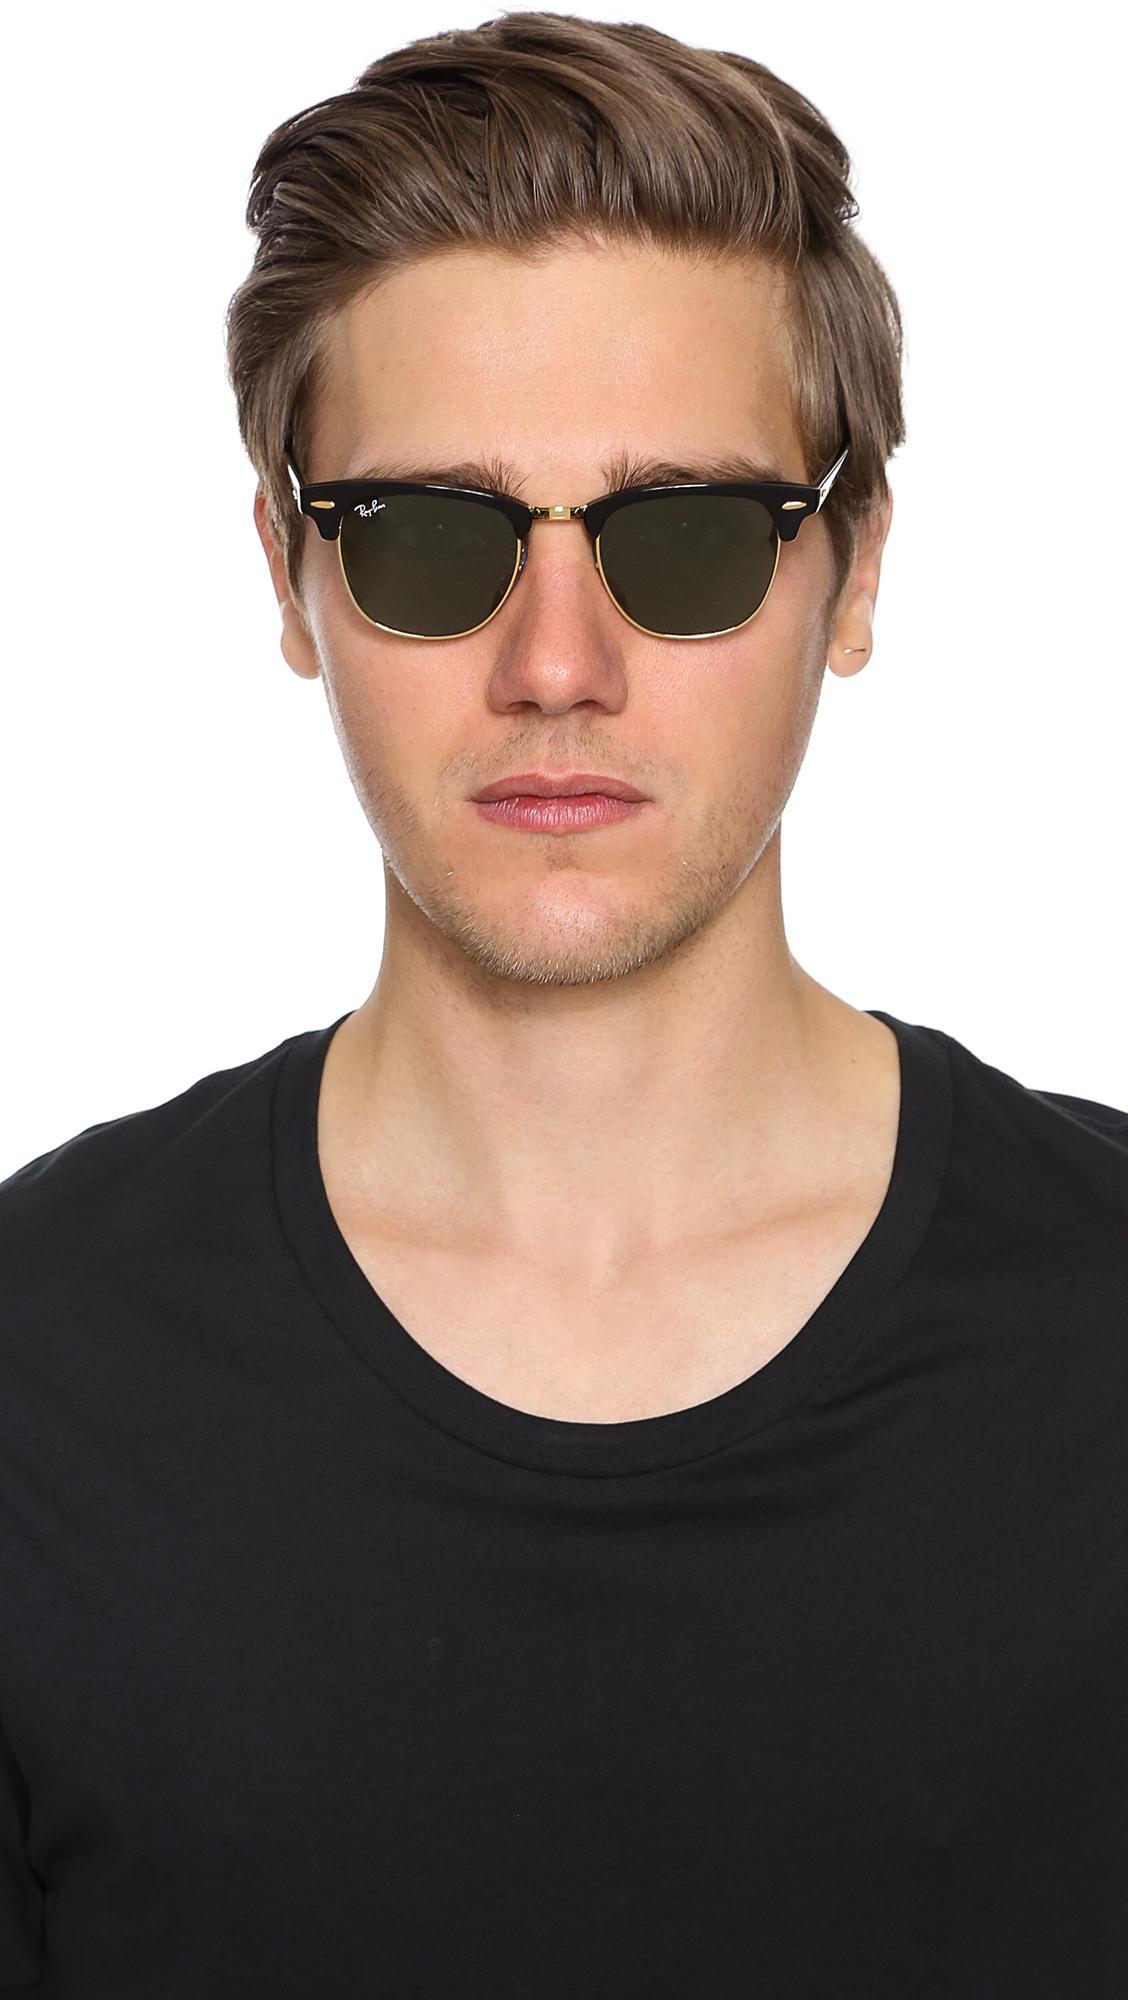 93df49afa Ray-Ban - Black Clubmaster Classic Sunglasses for Men - Lyst. View  fullscreen